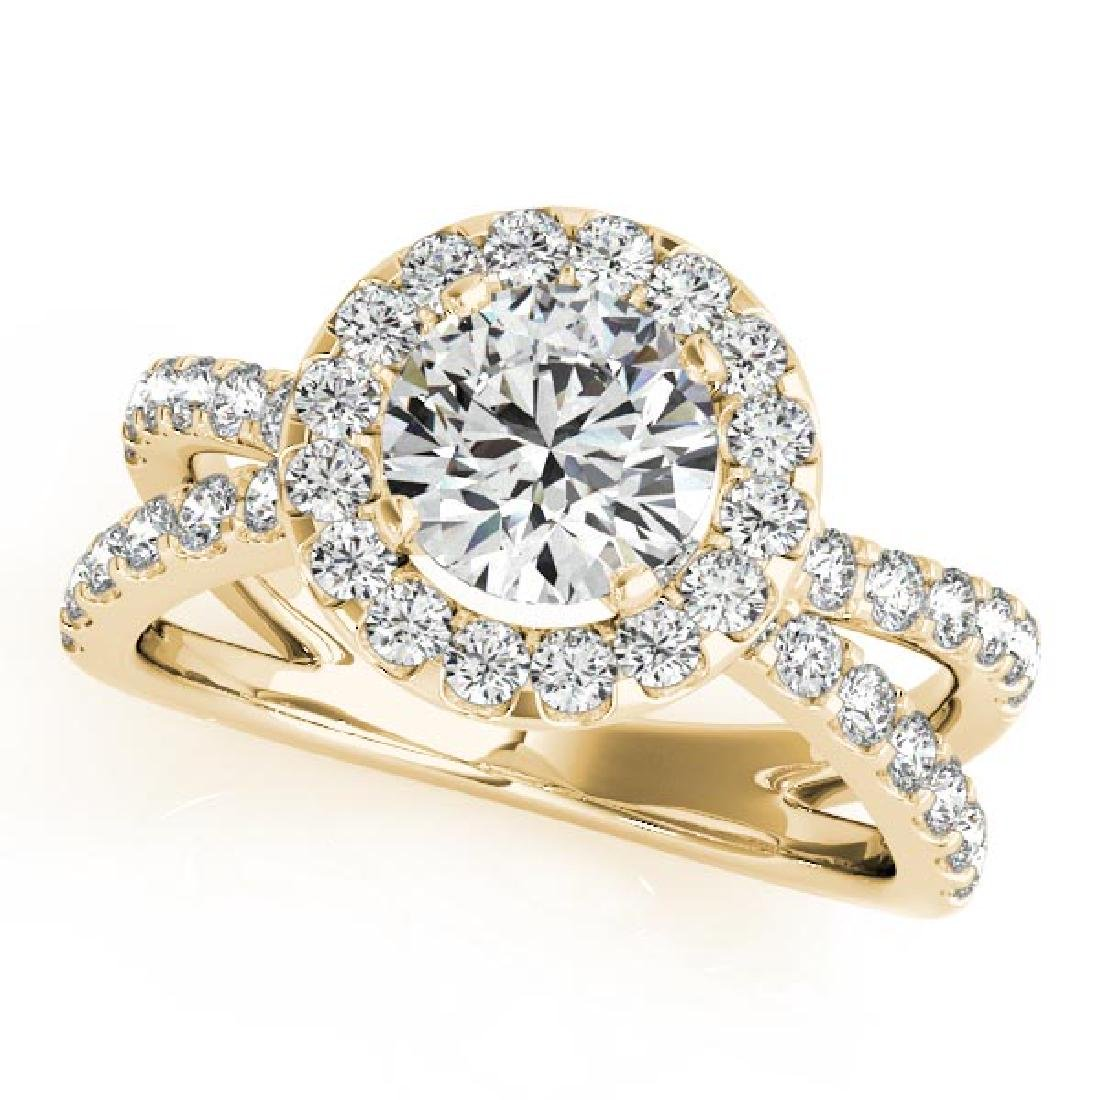 CERTIFIED 18K YELLOW GOLD 1.38 CT G-H/VS-SI1 DIAMOND HA